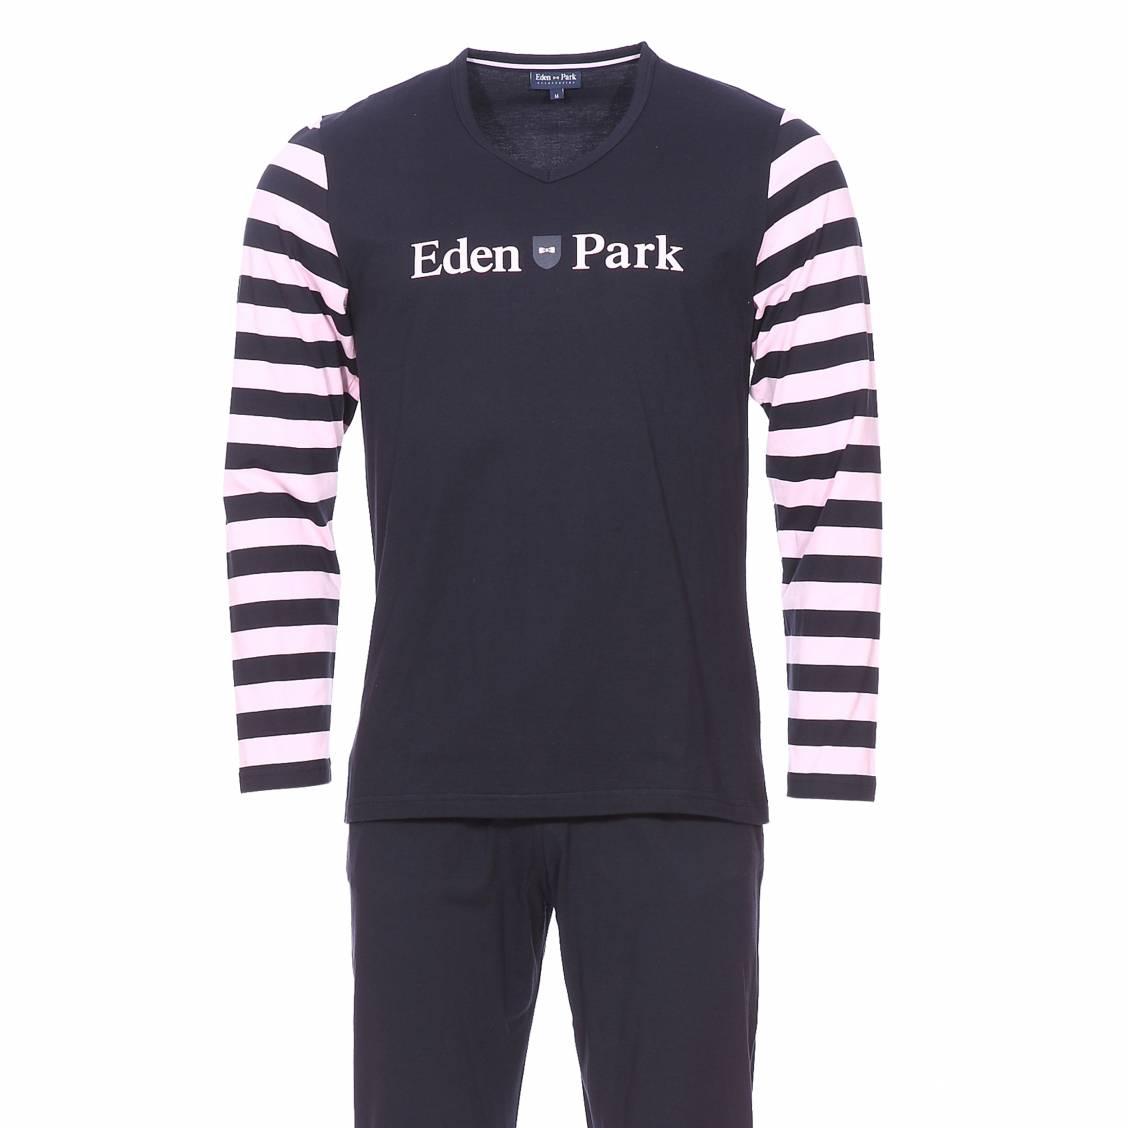 Pyjama long  en coton : tee-shirt col v bleu marine, manches longues à rayures rose pâle et pantalon uni bleu marine